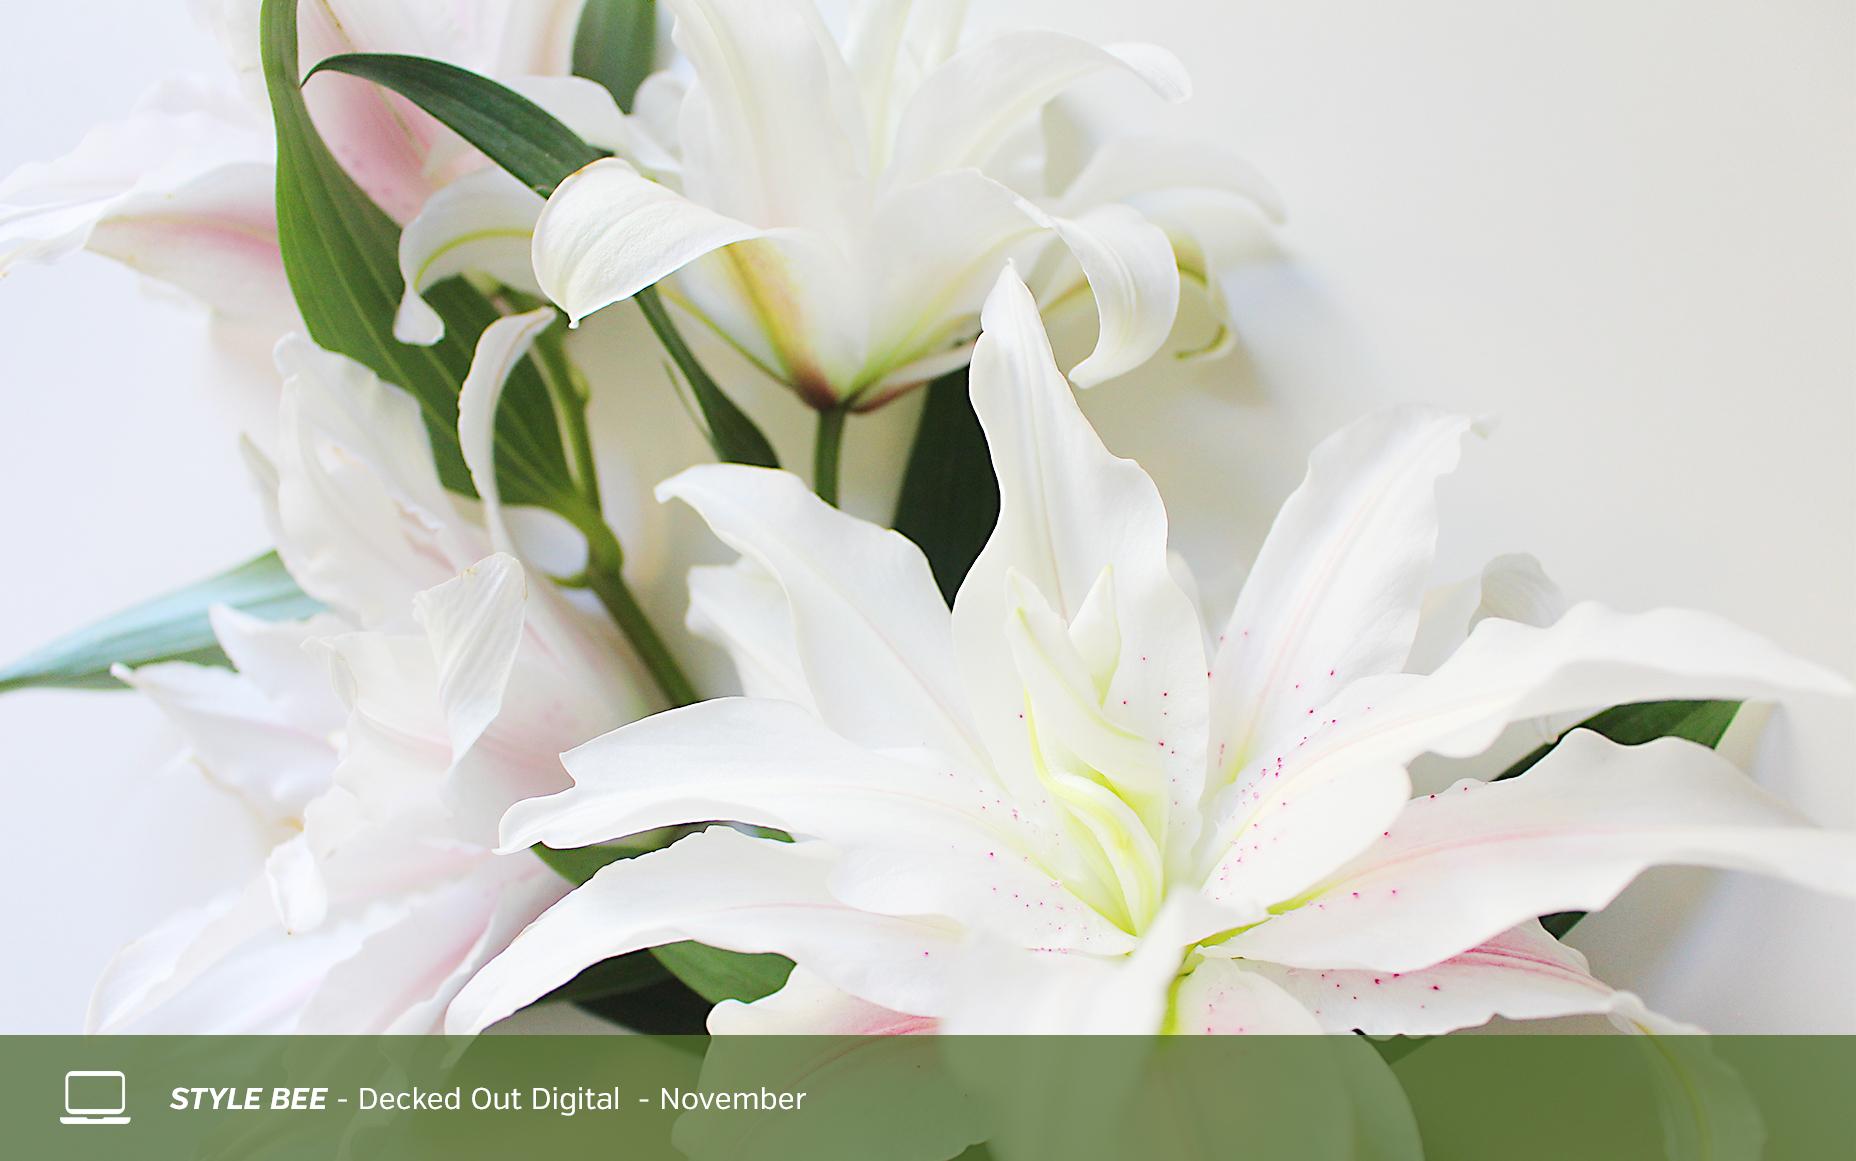 Style Bee - Digital Downloads - November